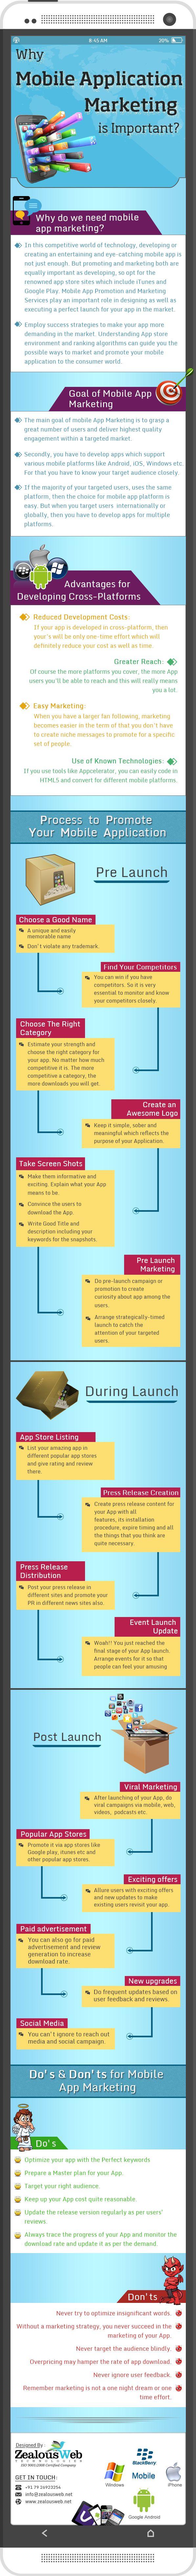 #INFOgraphic > Mobile Apps Marketing 101:   > http://infographicsmania.com/mobile-apps-marketing-101/?utm_source=Pinterest&utm_medium=INFOGRAPHICSMANIA&utm_campaign=SNAP